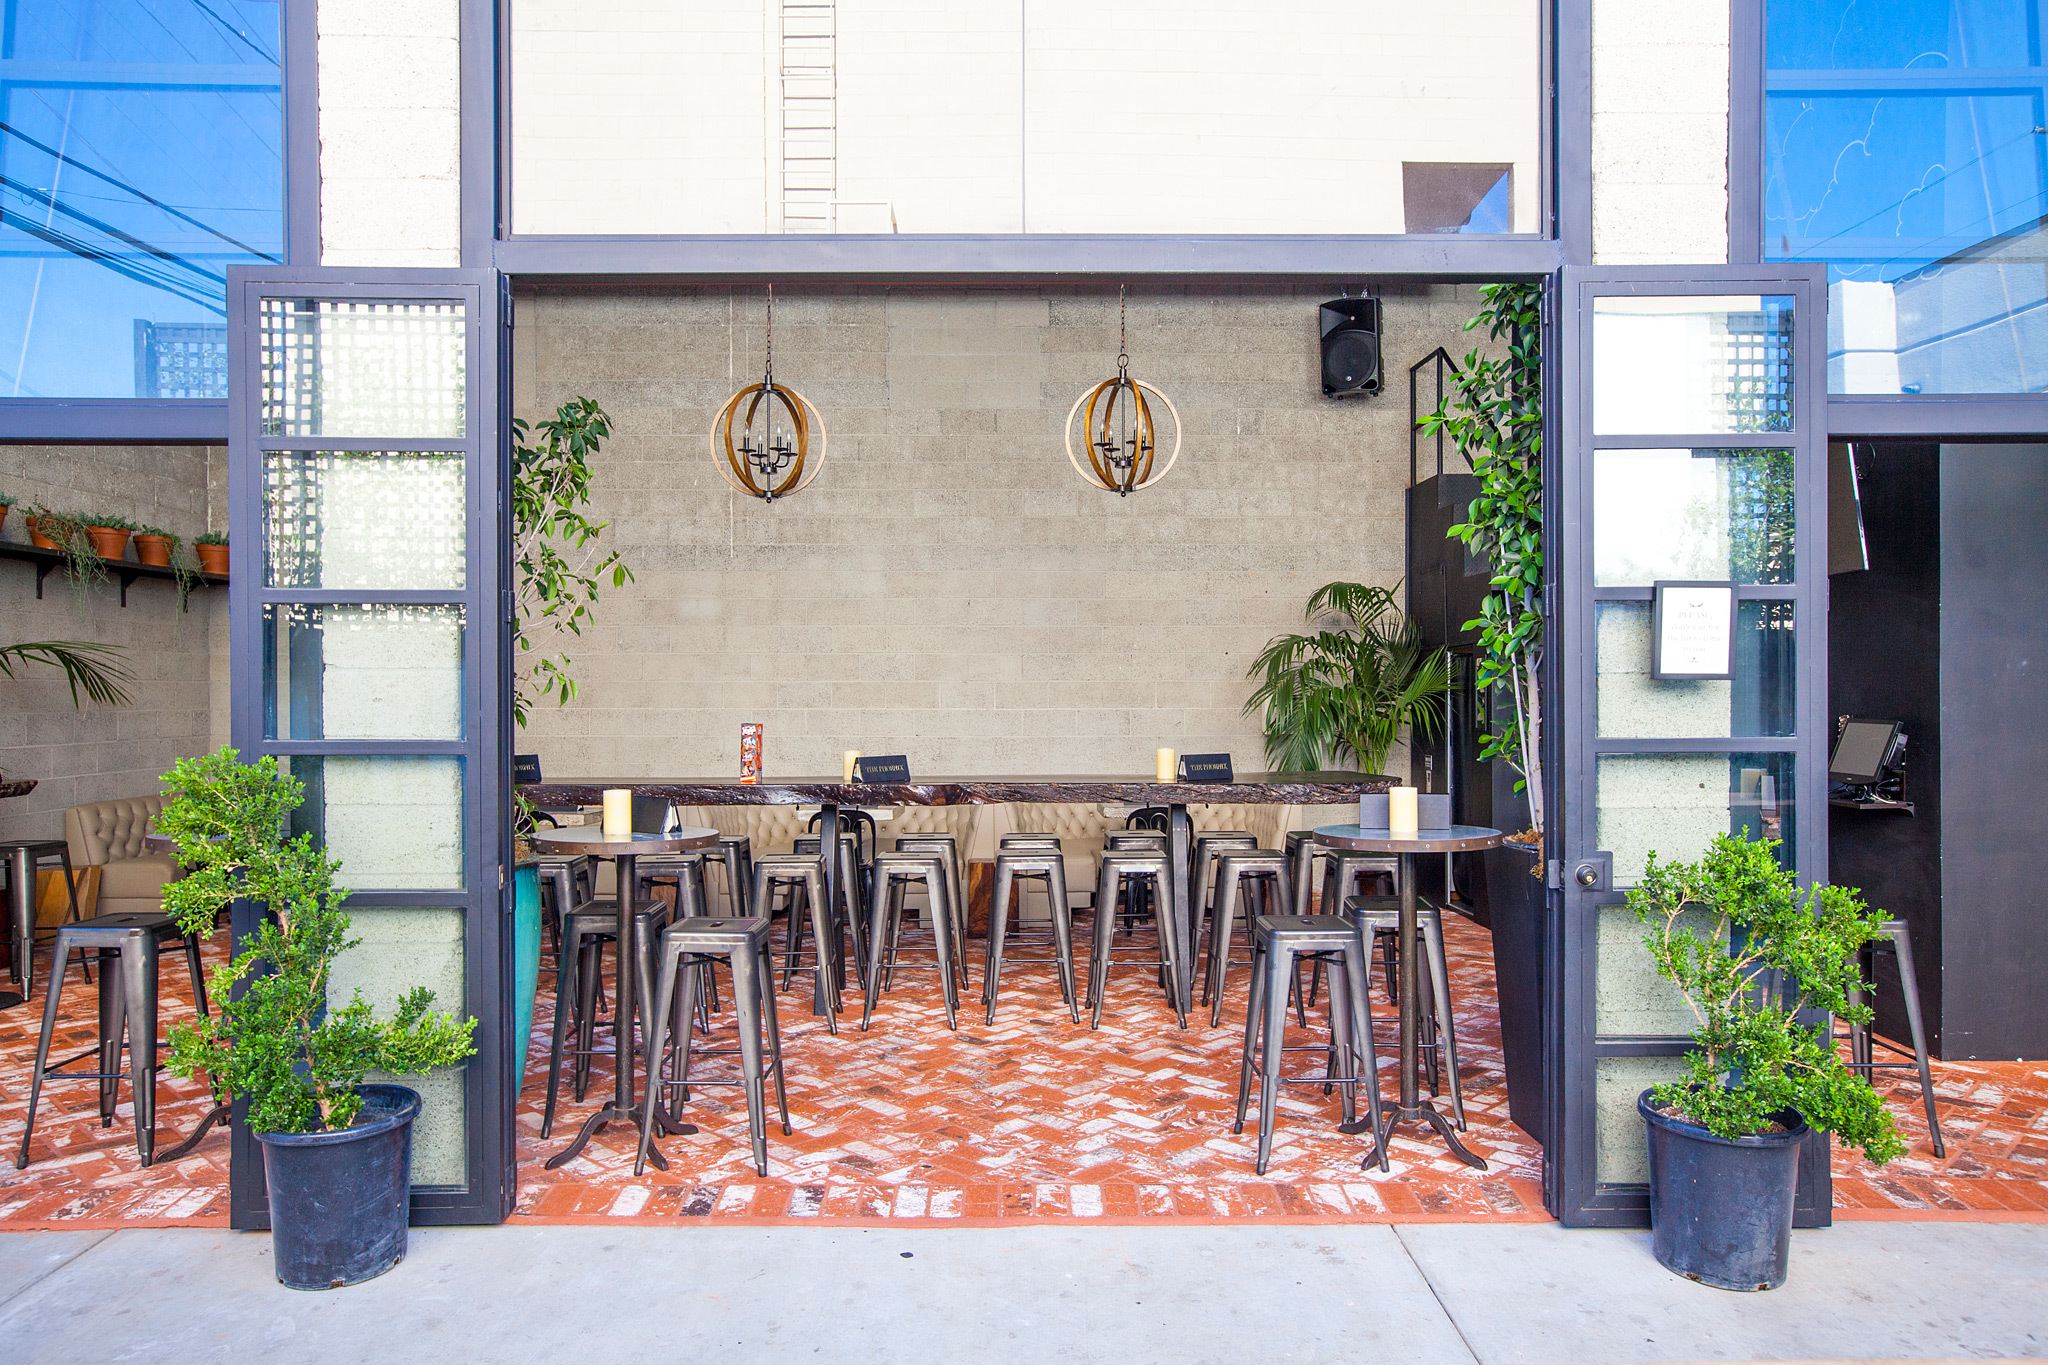 Bar review: The Phoenix